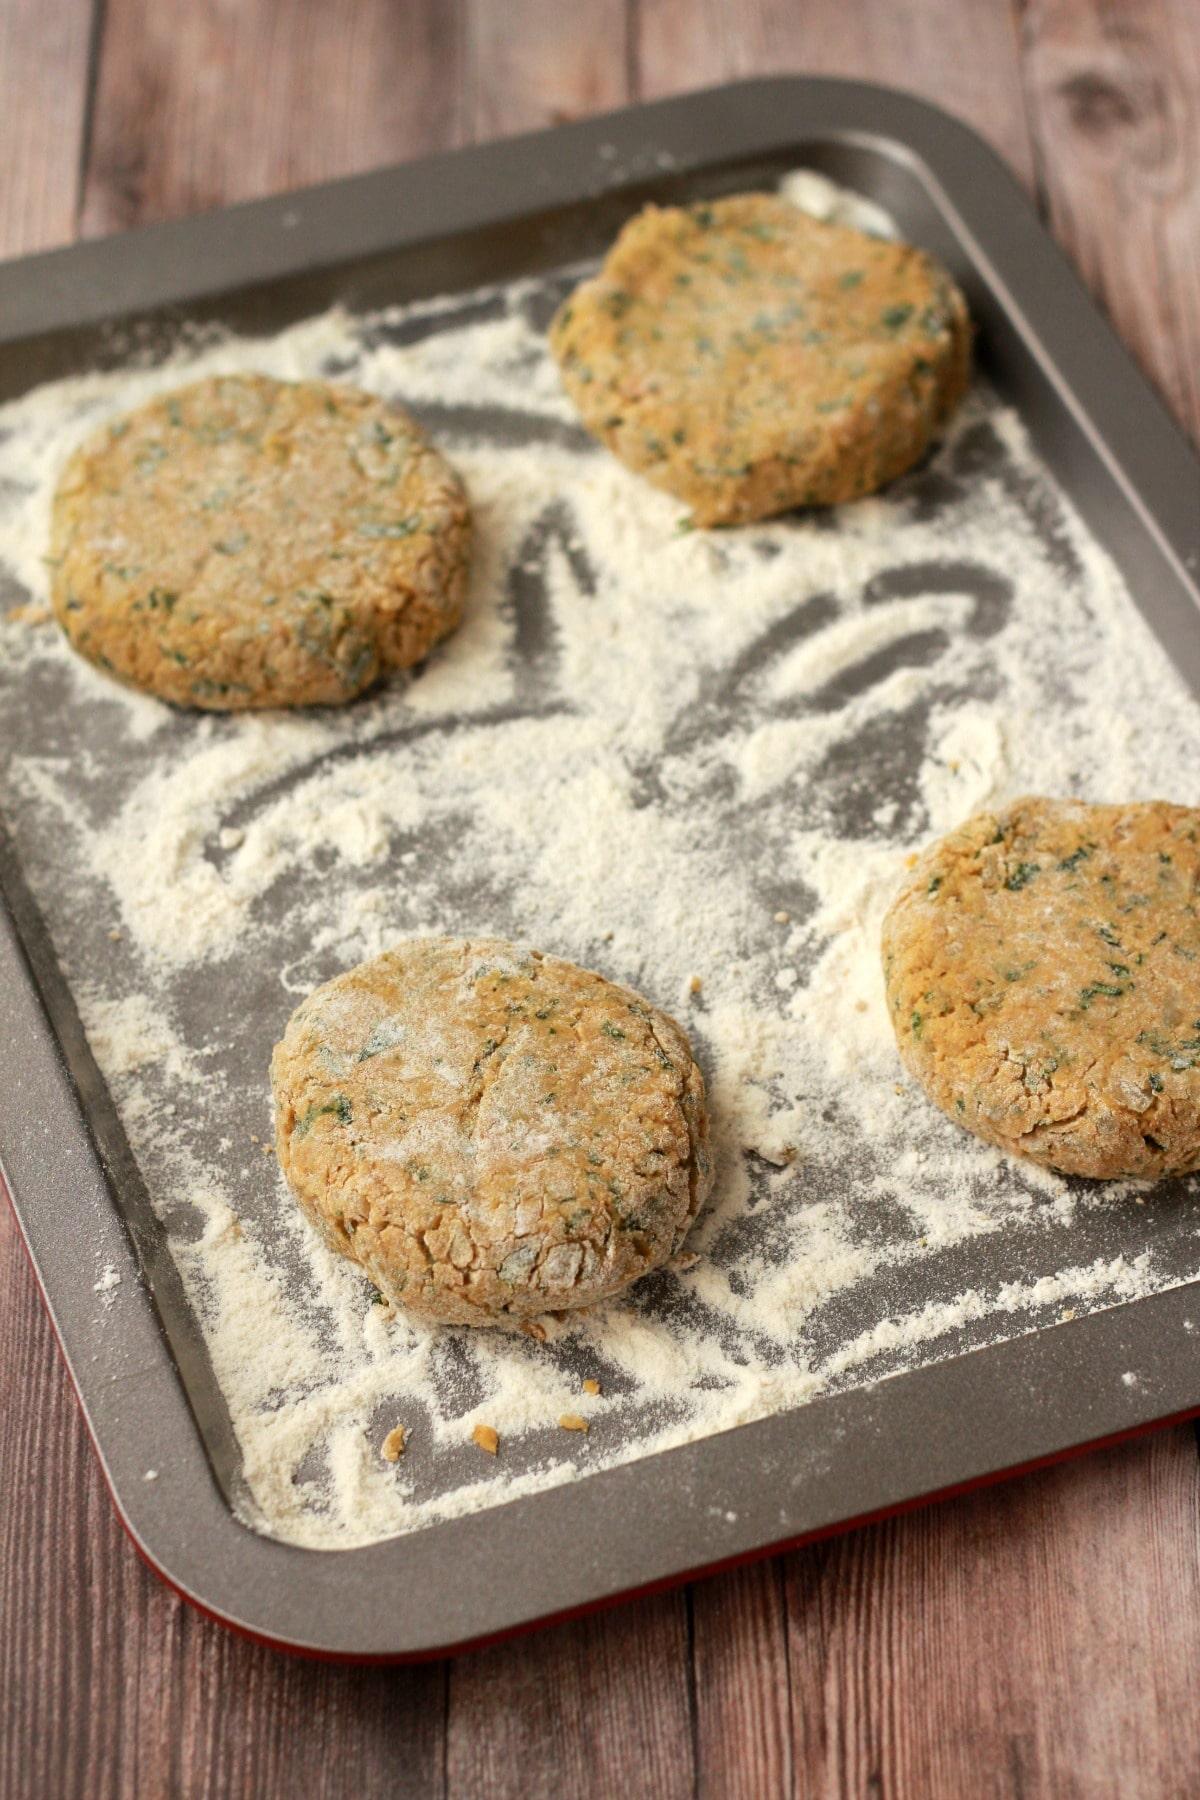 Making Vegan Chickpea Burgers #vegan #lovingitvegan #veggieburgers